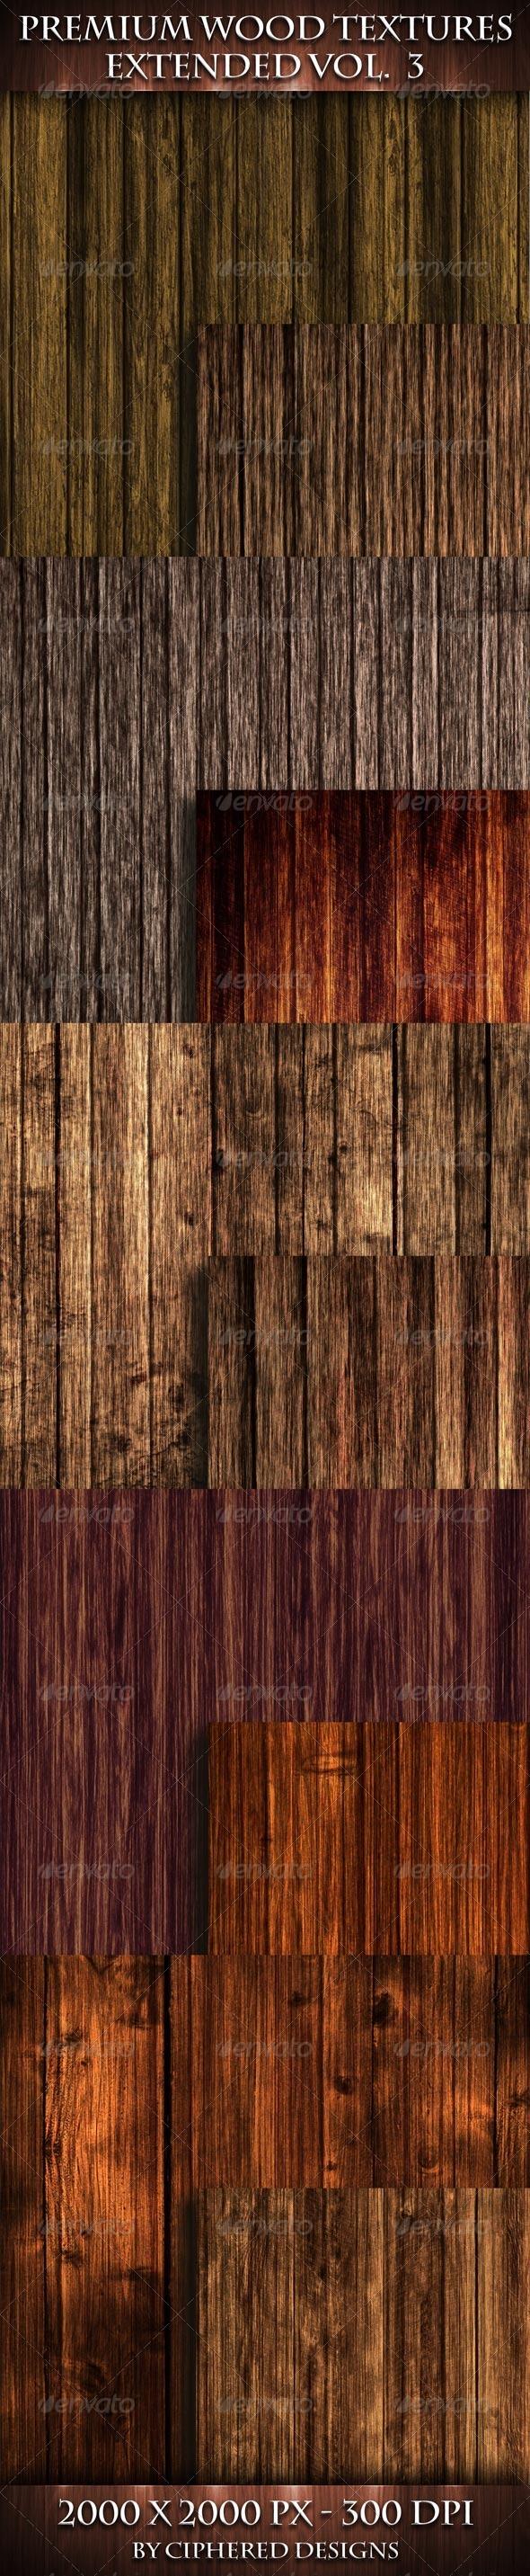 Premium Wood Textures Extended - Vol 2 - Wood Textures